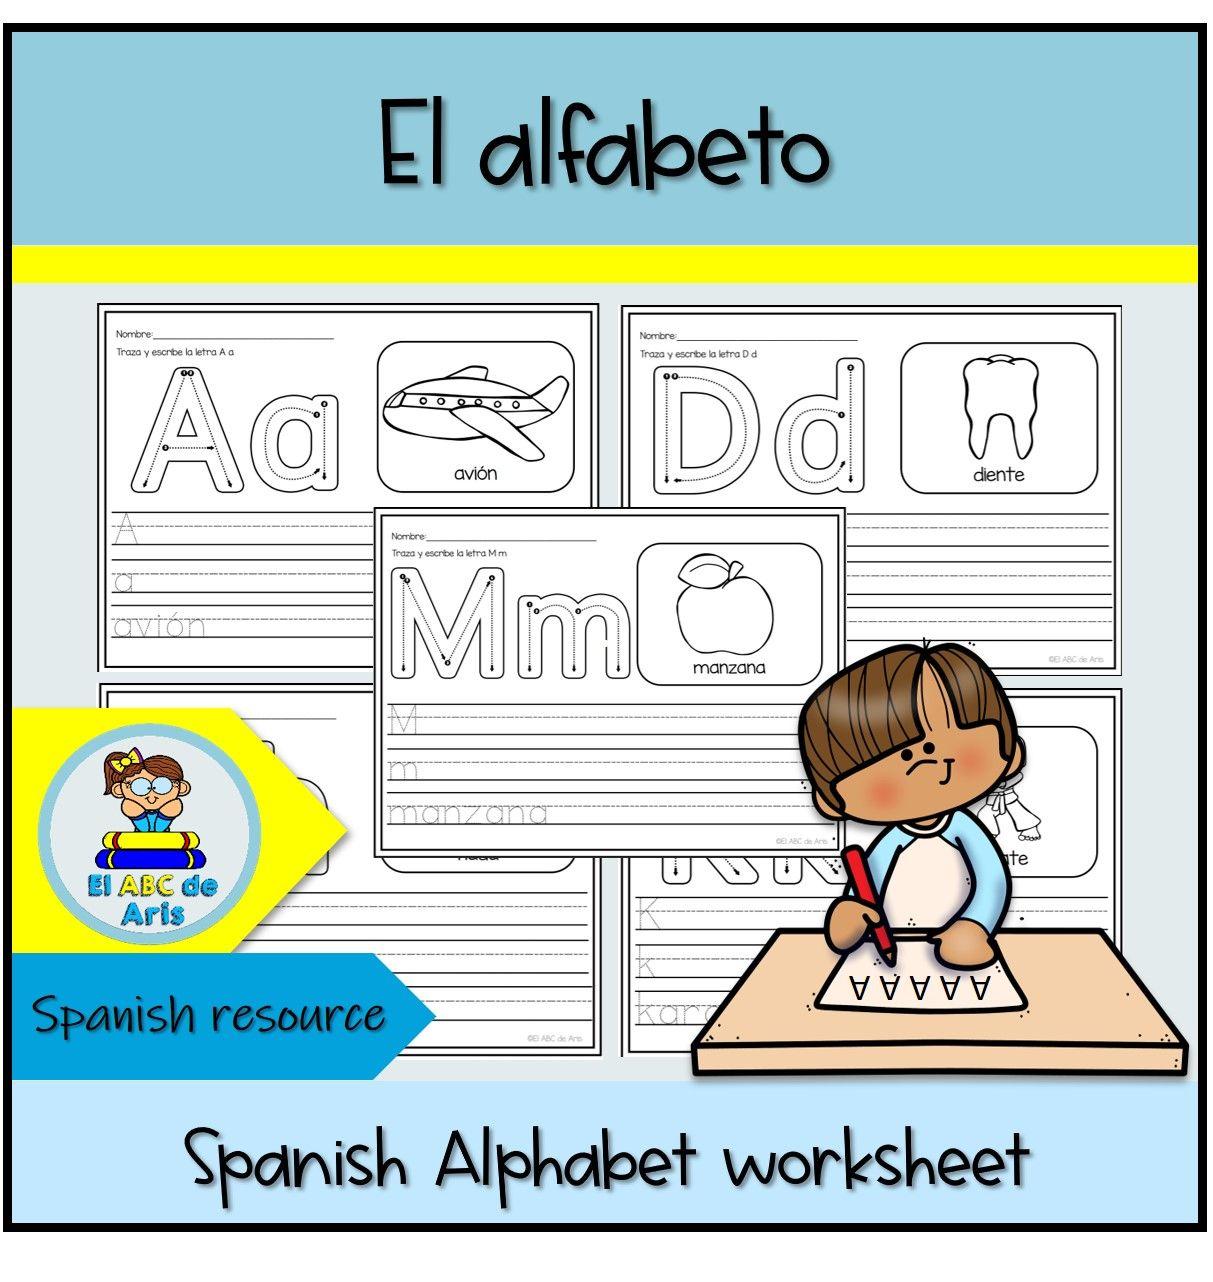 El Alfabeto Spanish Alphabet Worksheet Este Recurso Es